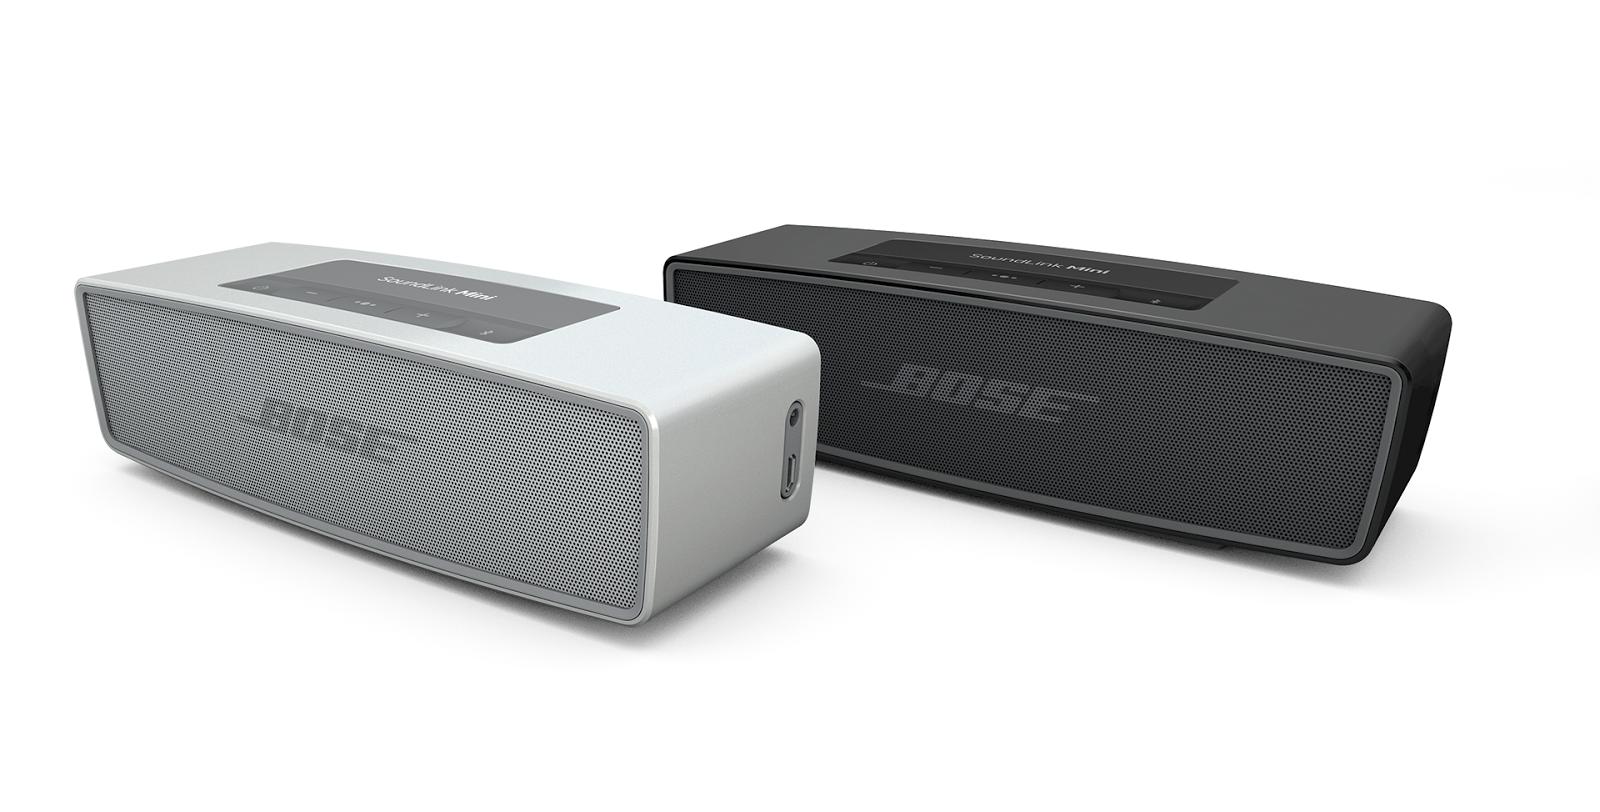 audiosplitz bose soundlink mini ii a first look. Black Bedroom Furniture Sets. Home Design Ideas